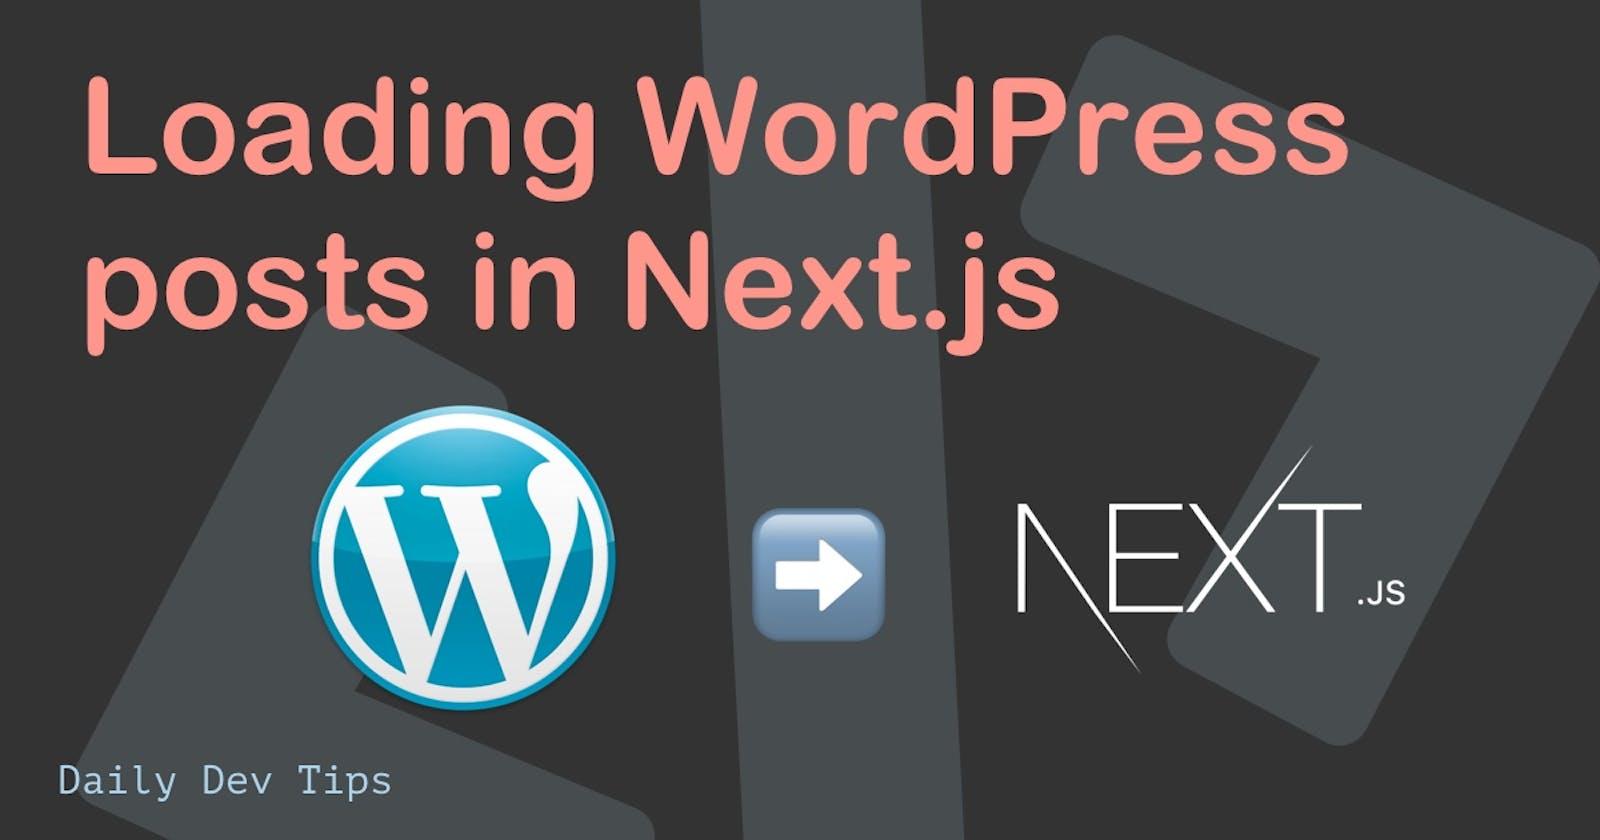 Loading WordPress posts in Next.js